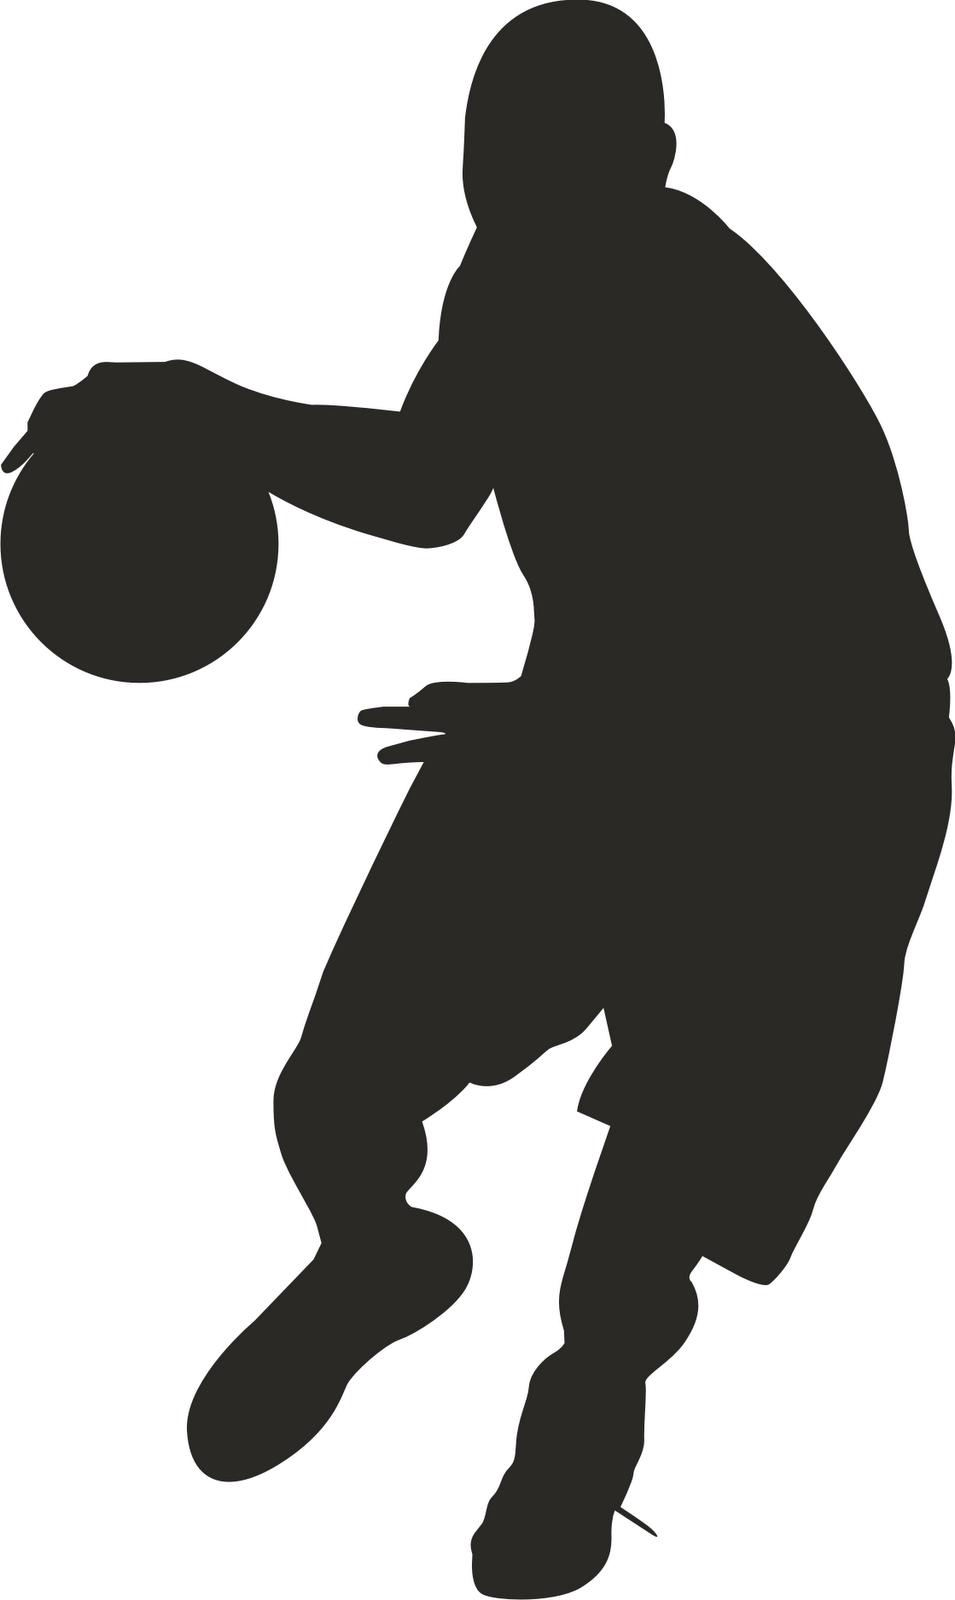 Clip art basketball clipart silhouette